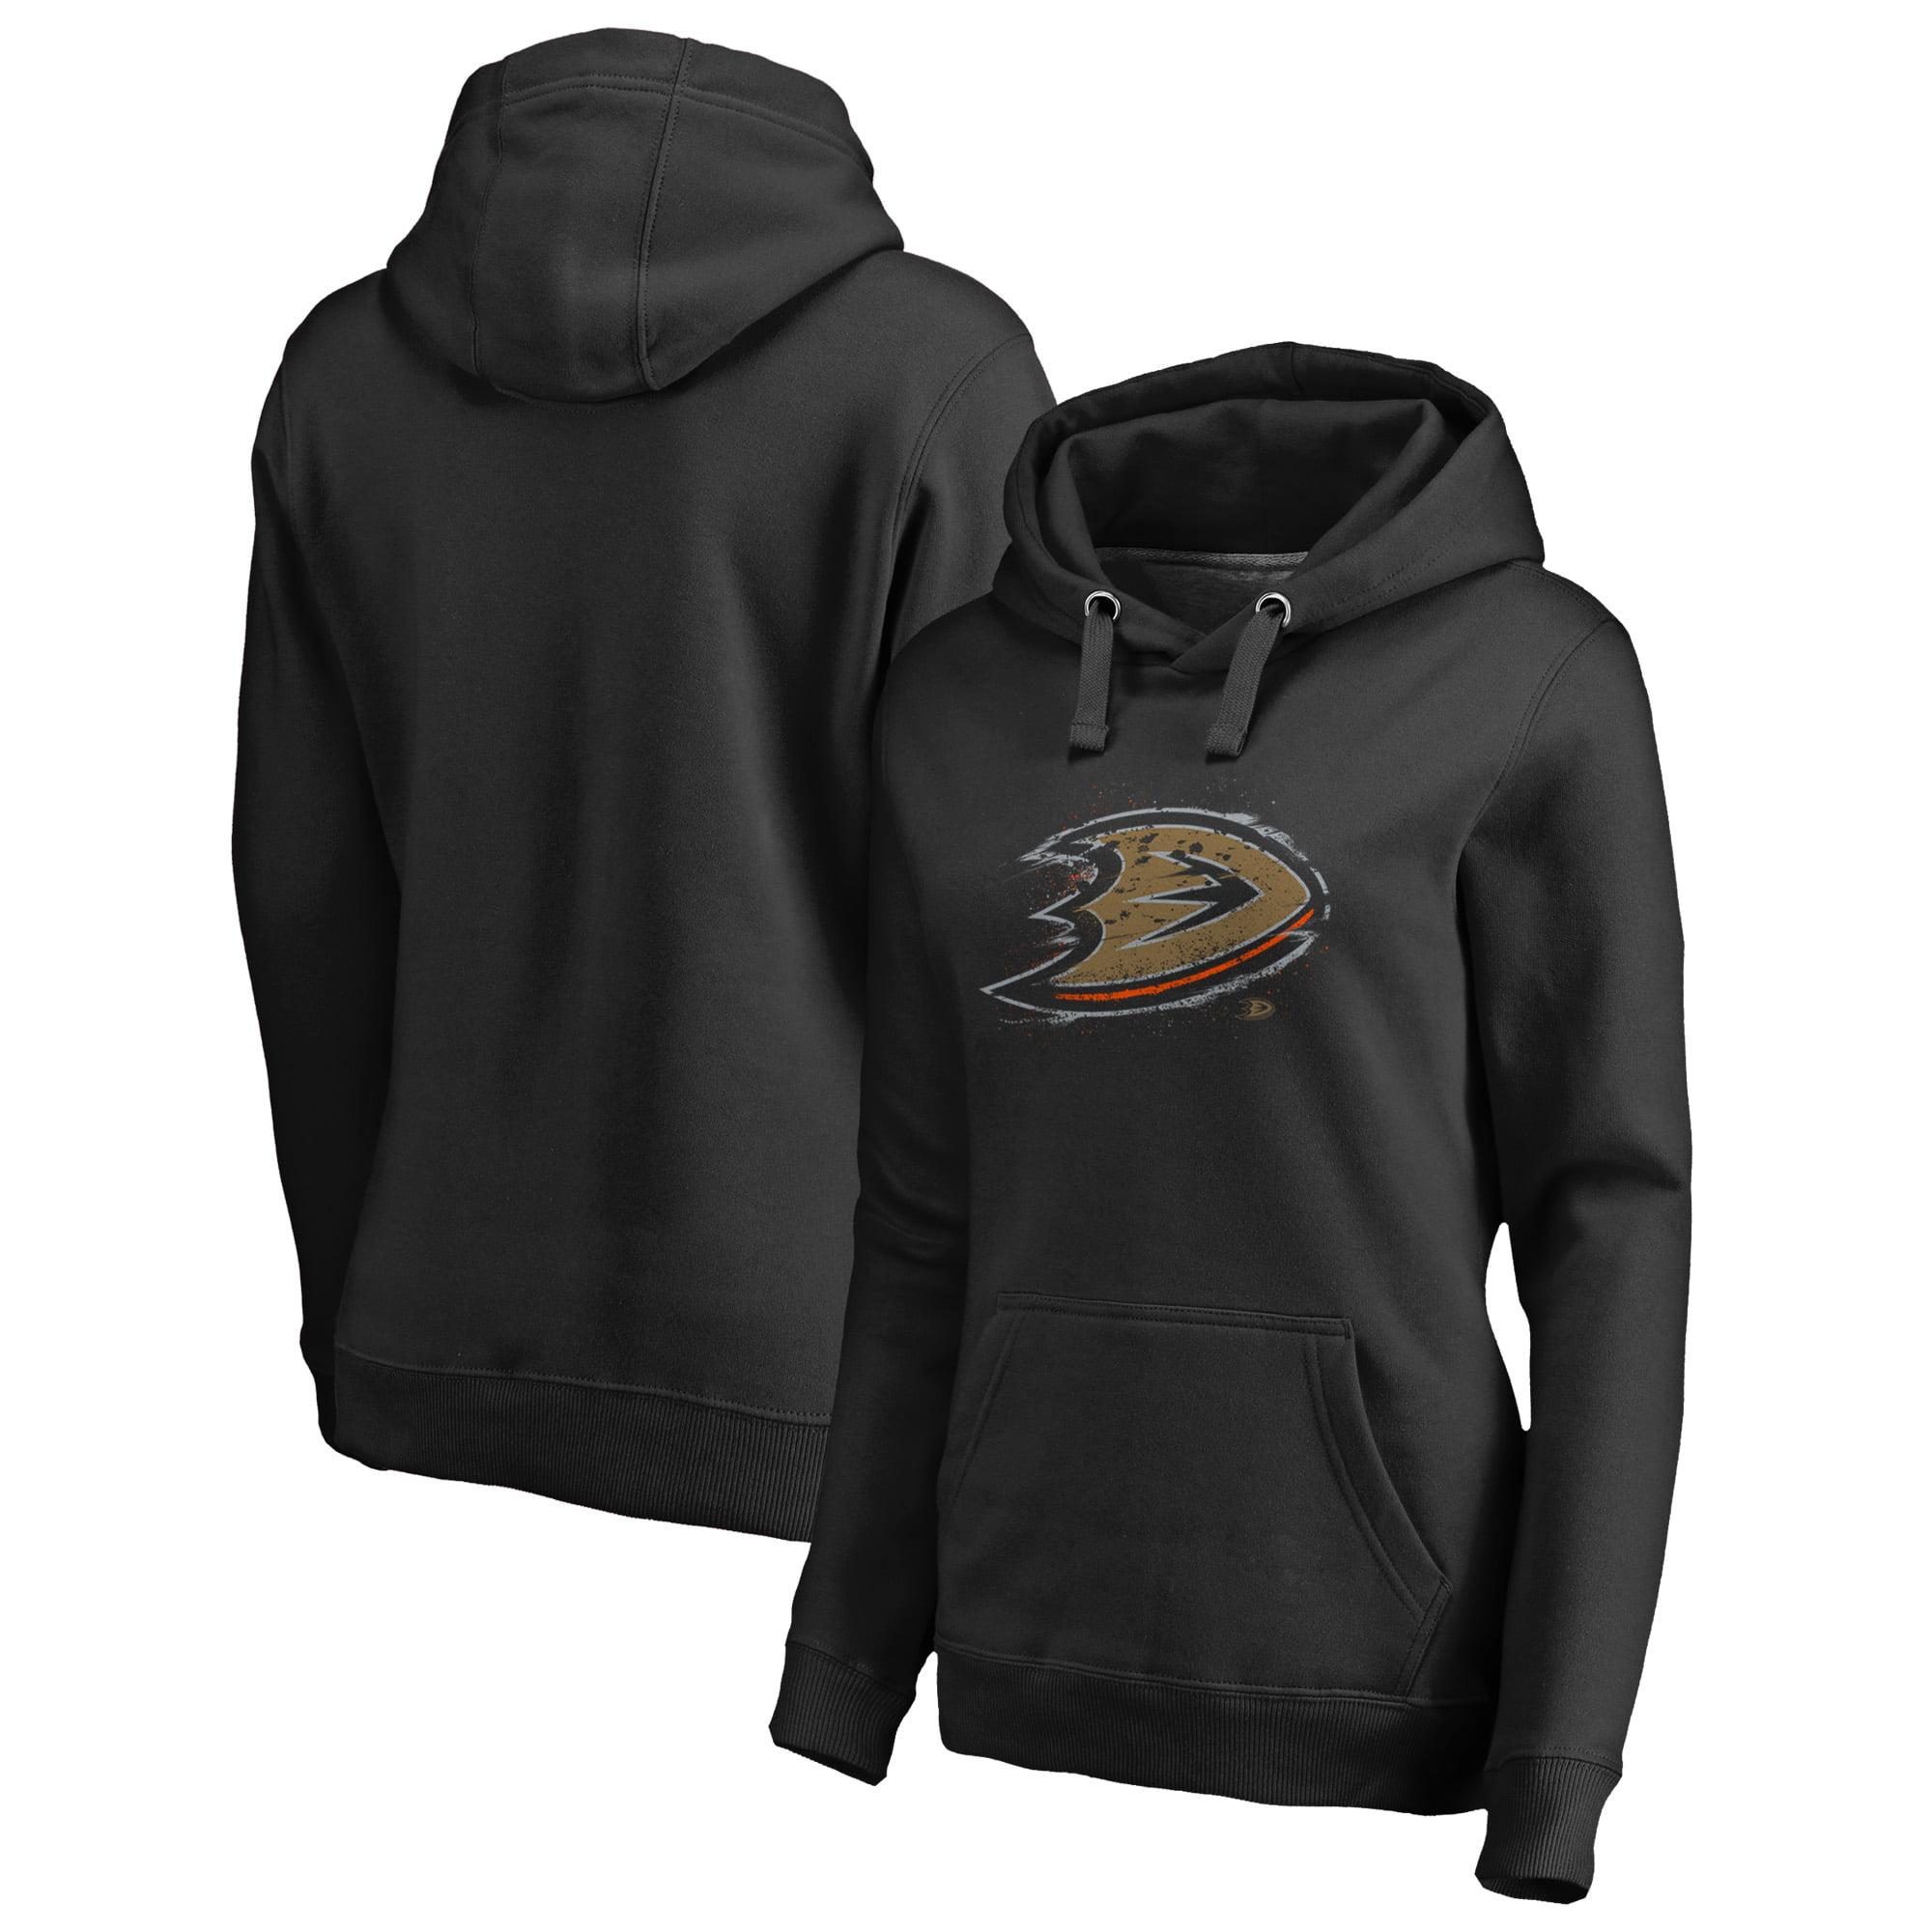 Anaheim Ducks Fanatics Branded Women's Splatter Logo Plus Size Pullover Hoodie - Black